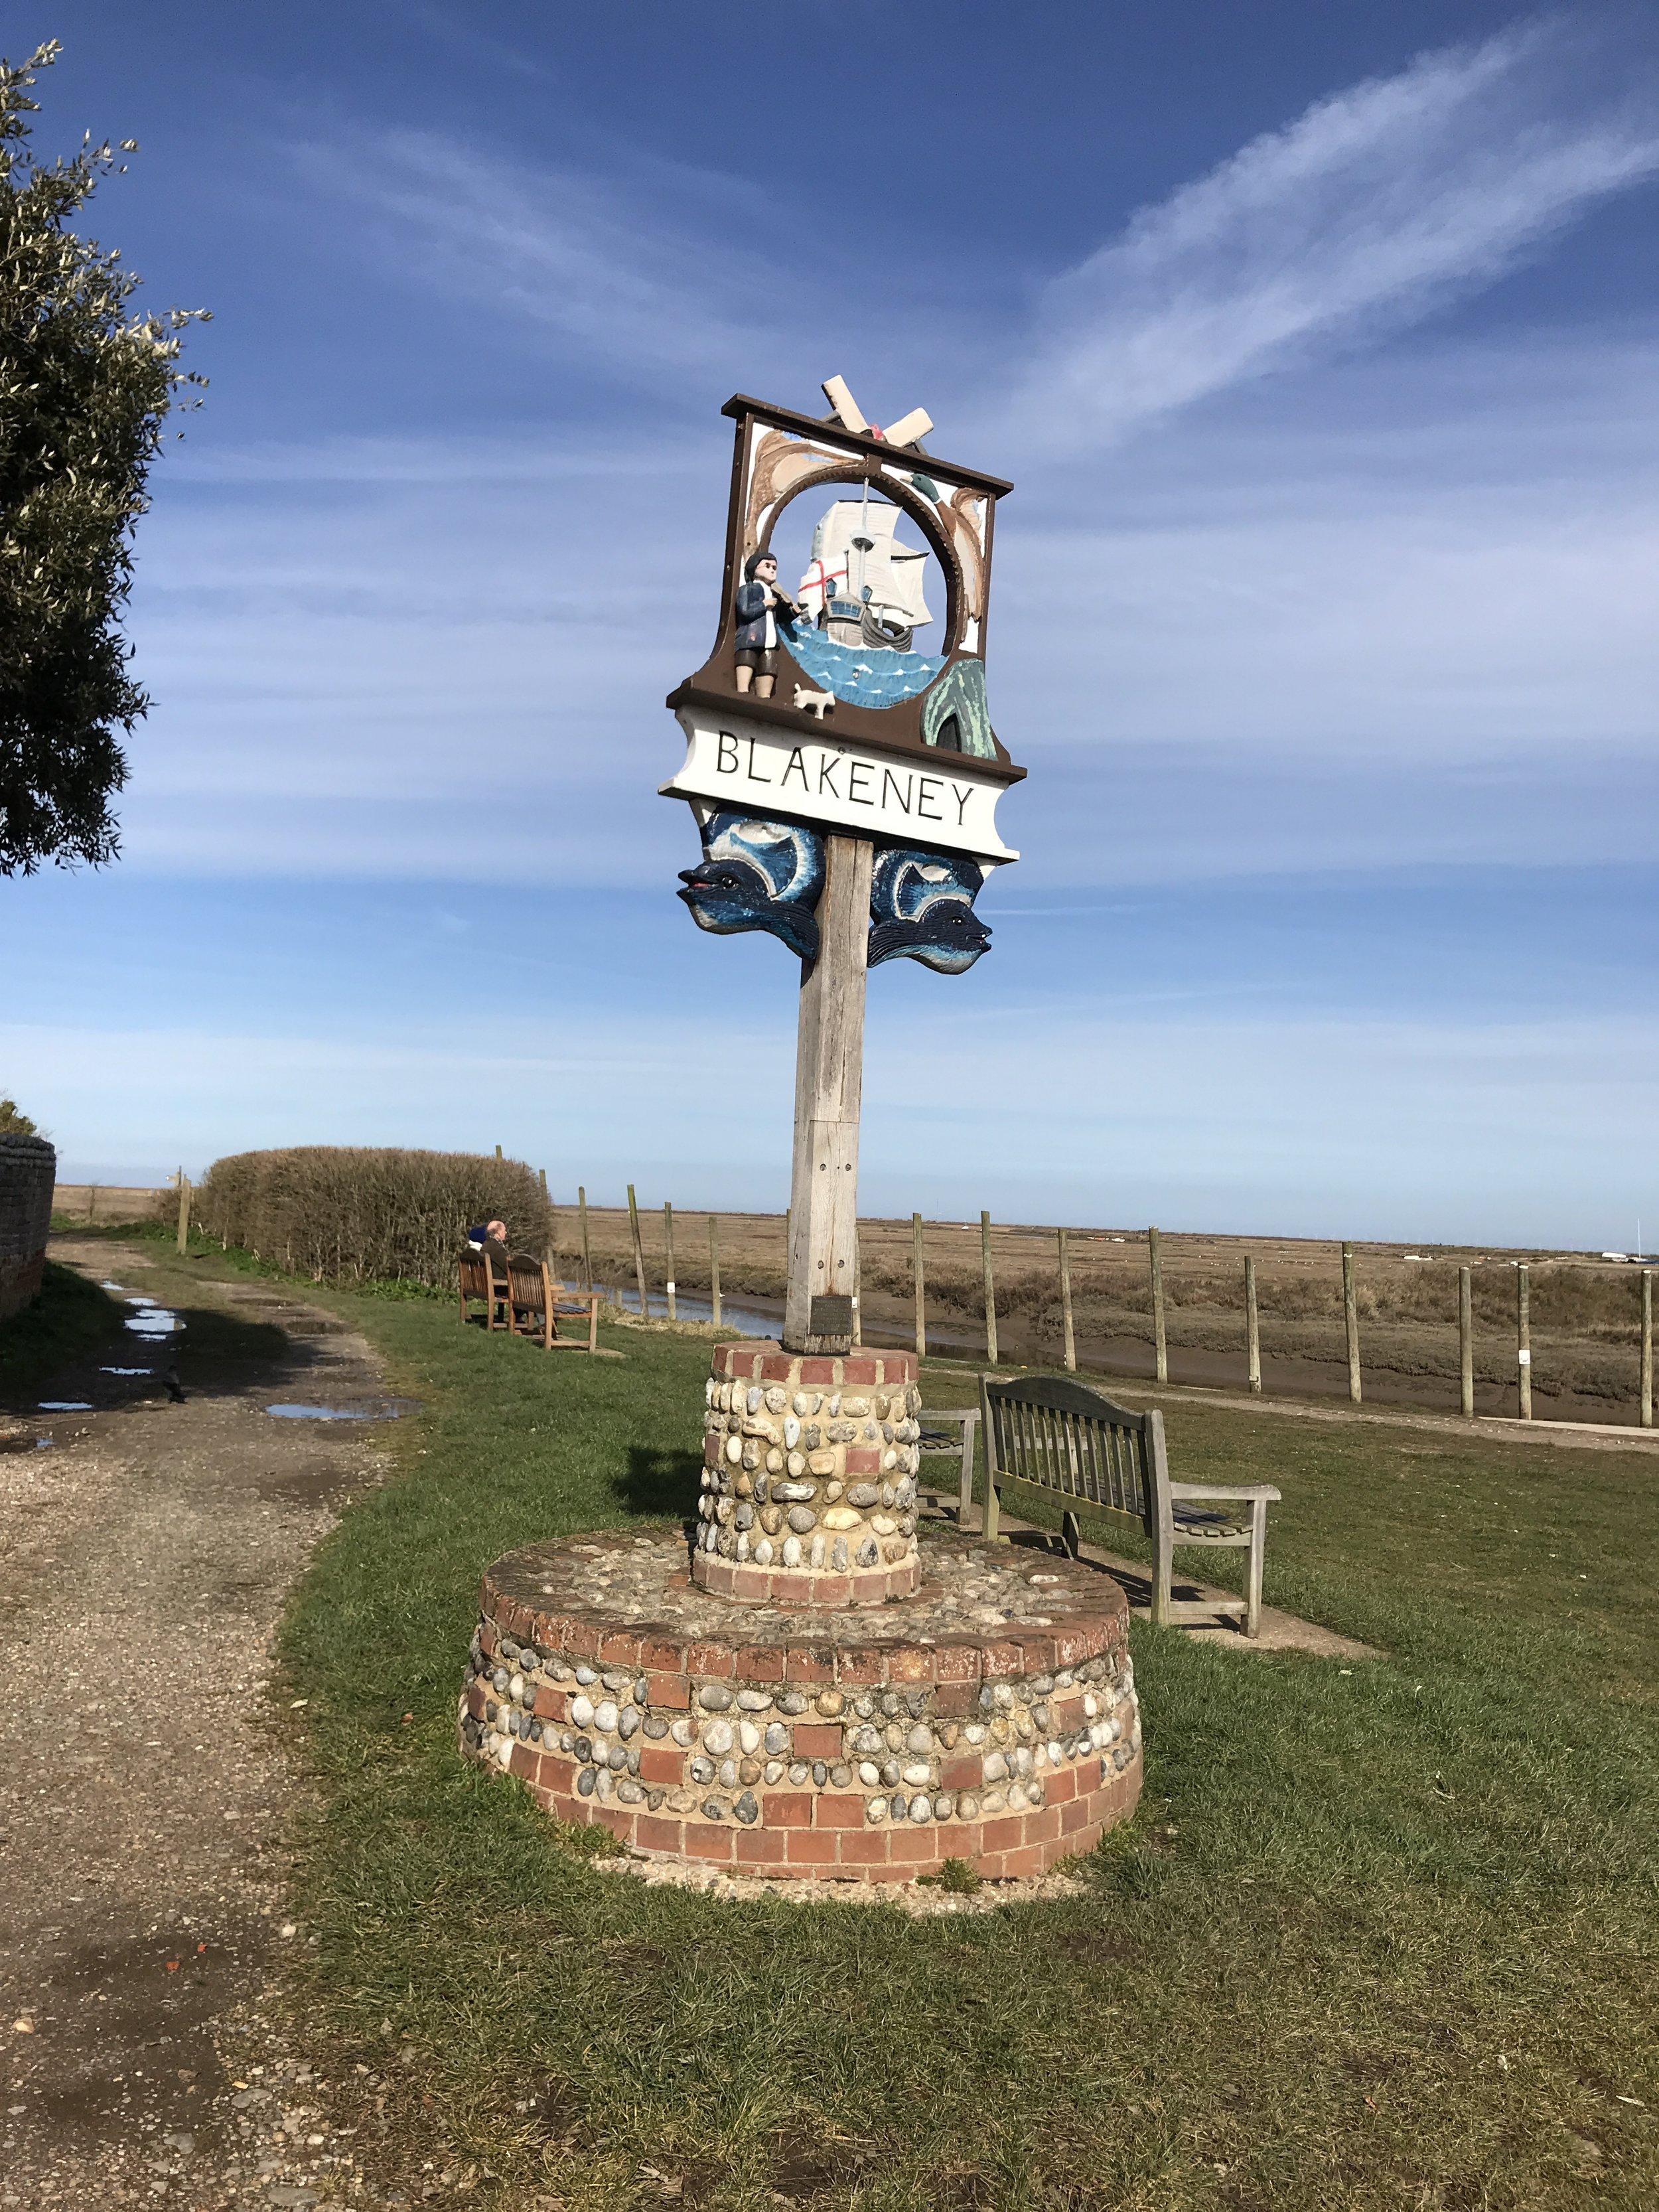 walk-Blakeney-Morston-coast-path